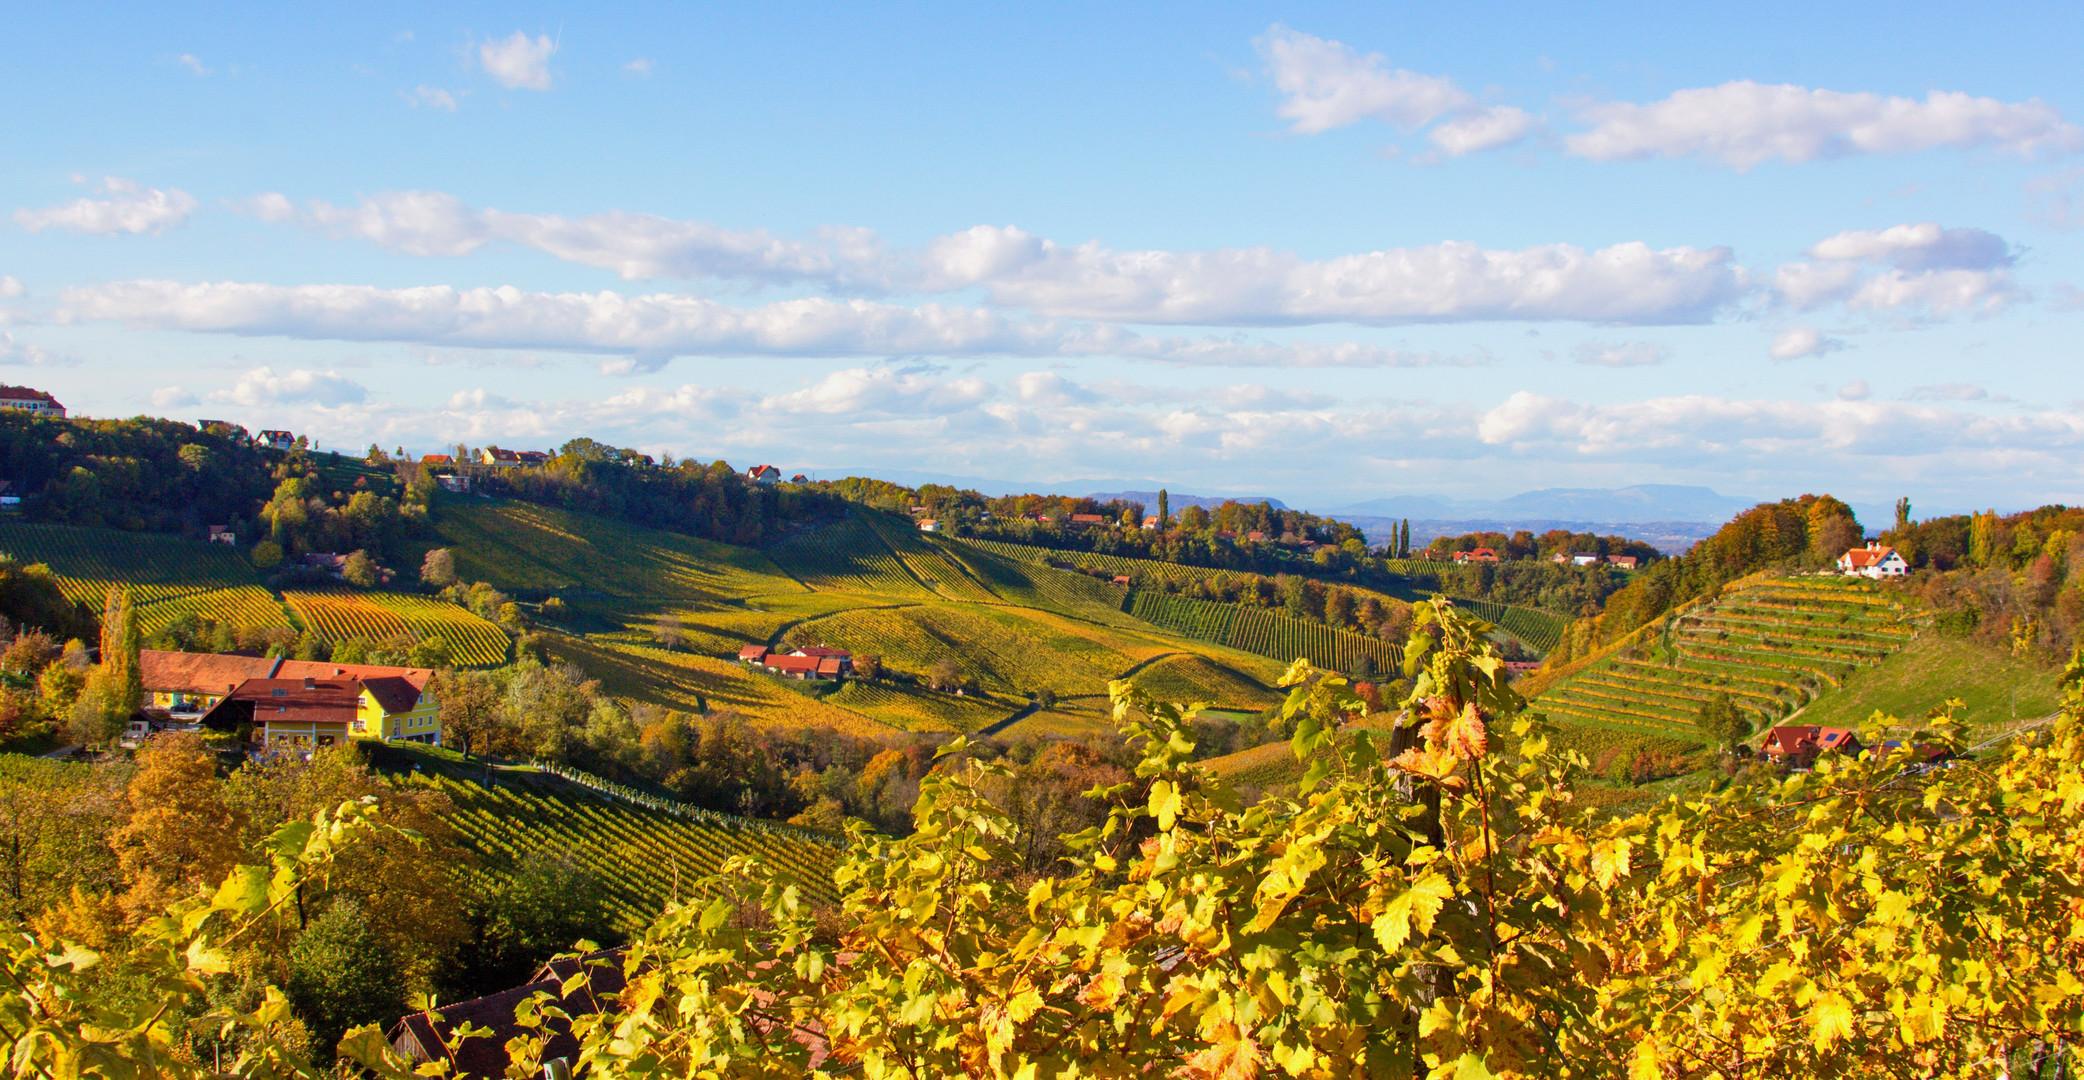 Berghausenregion im Herbst